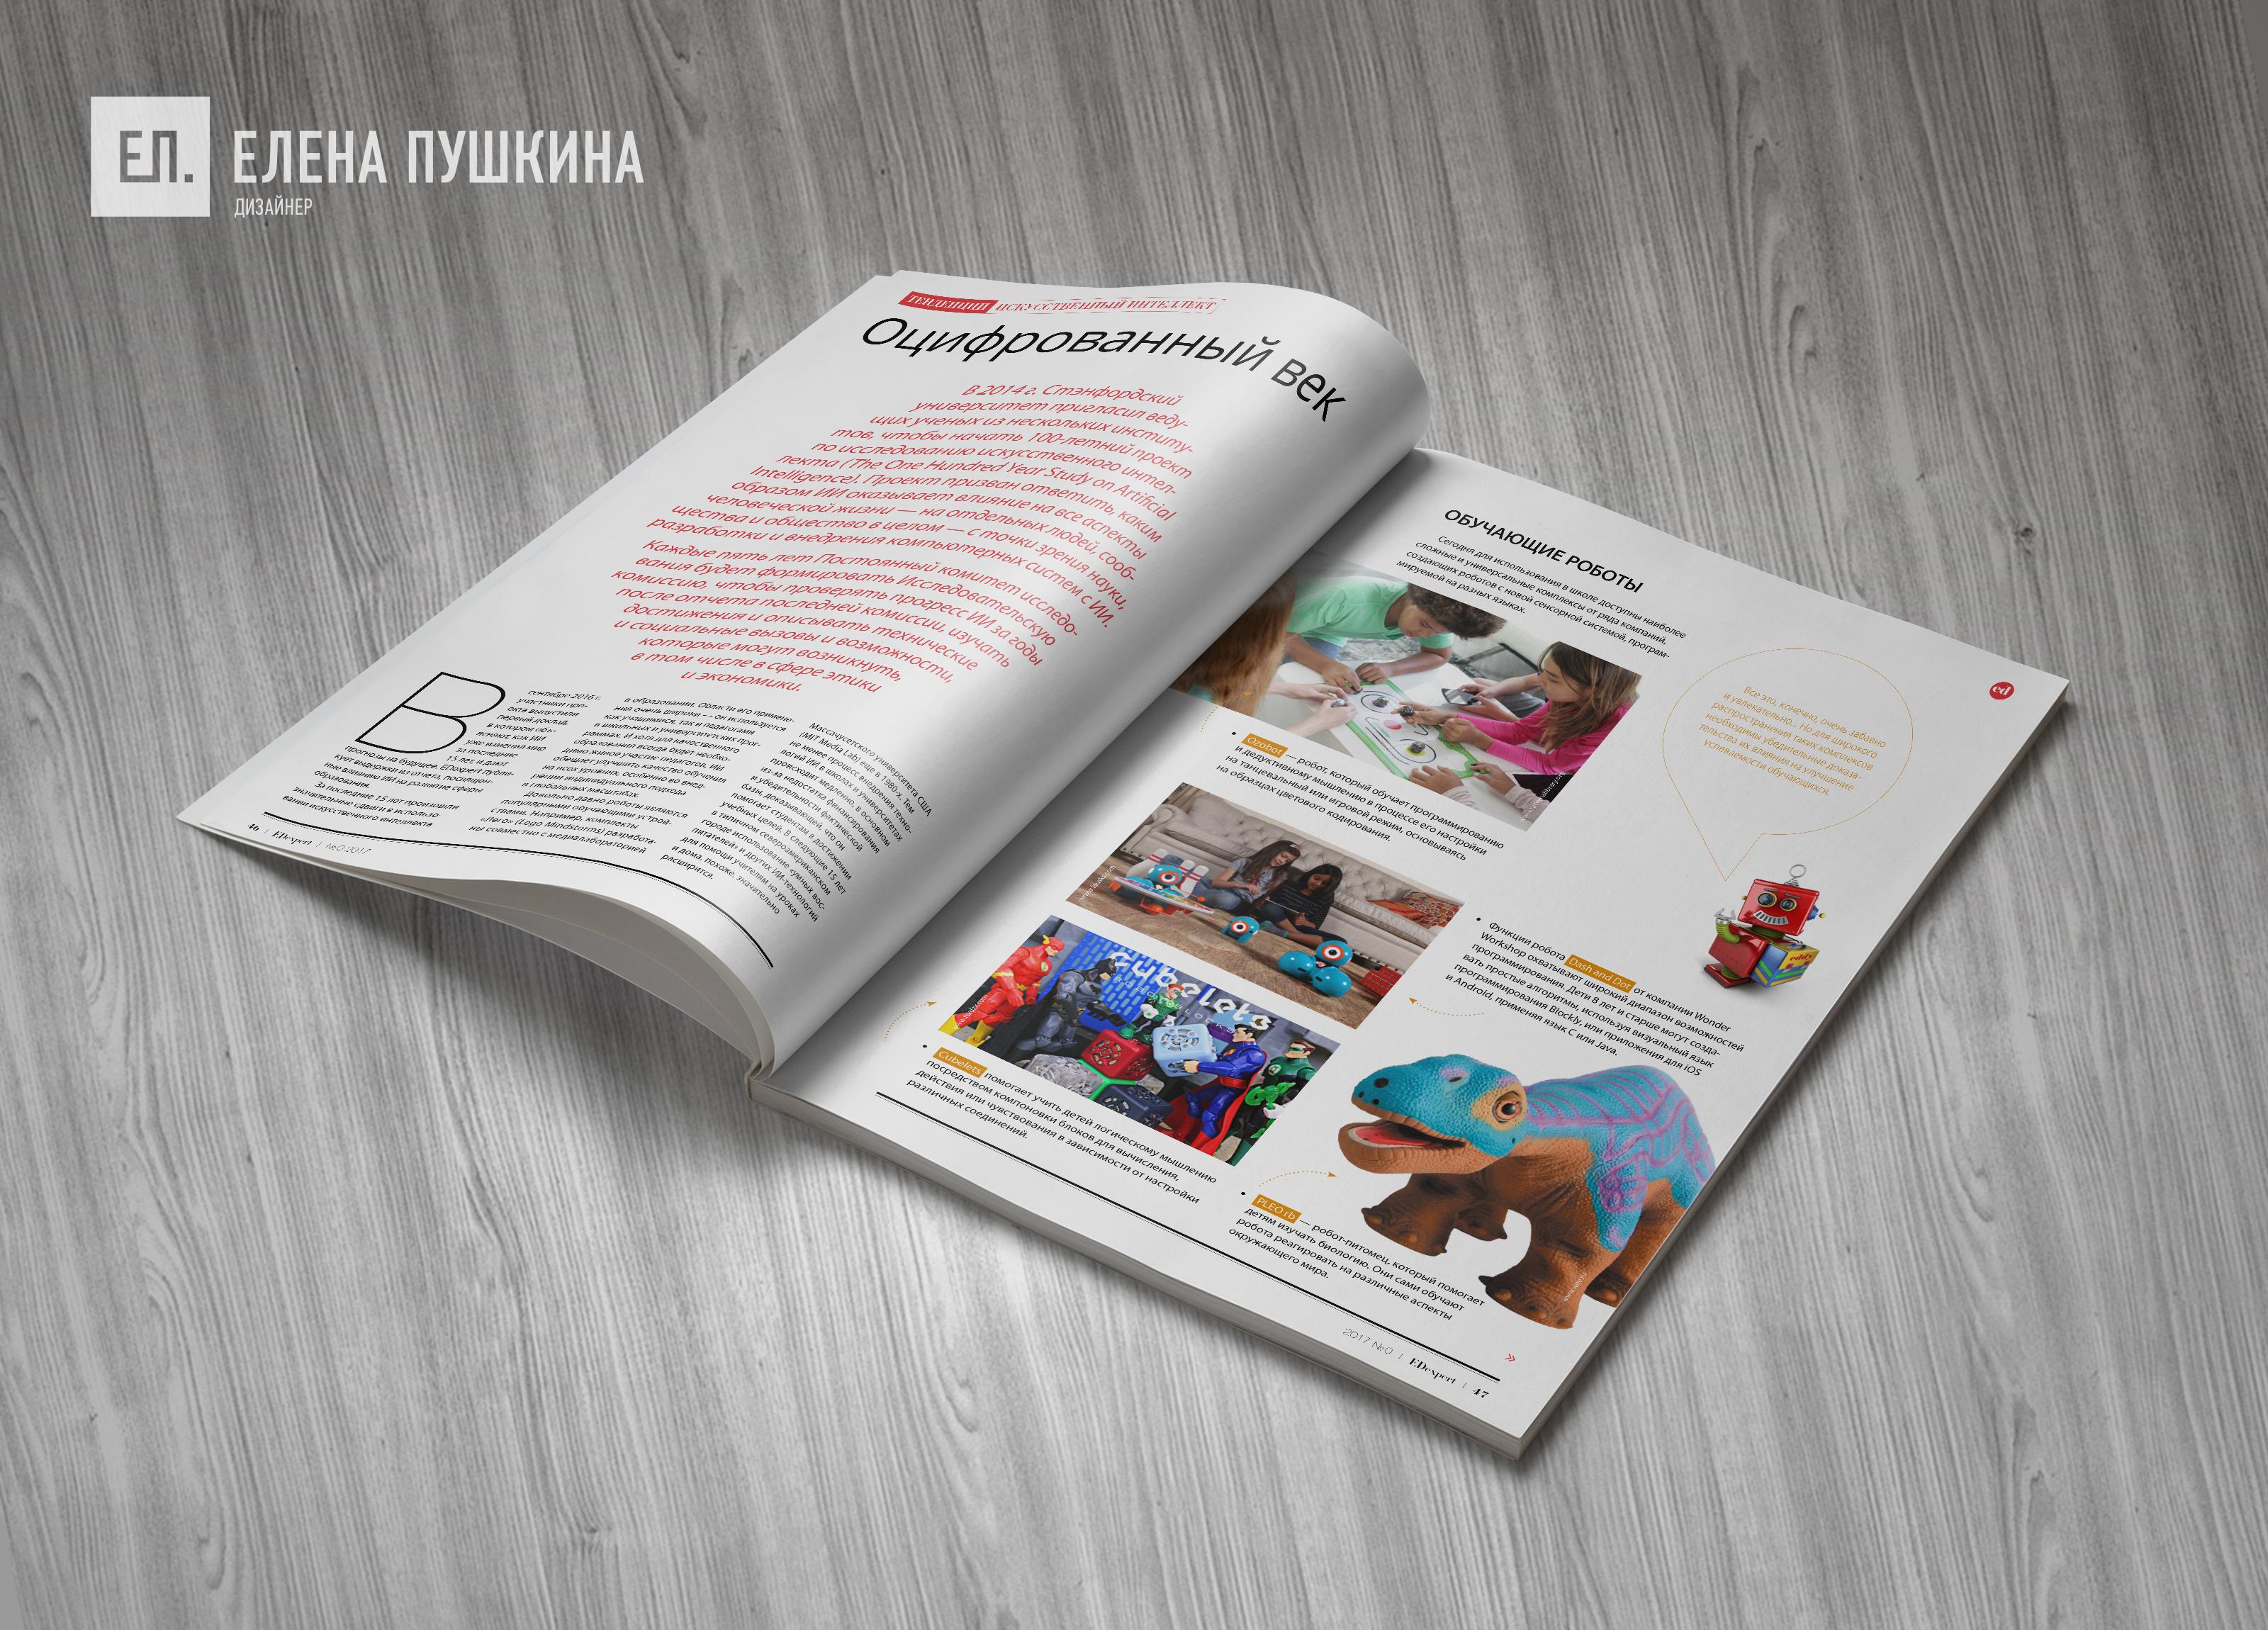 Журнал «EDexpert» №0 весна 2017— разработка с«нуля» логотипа, обложки, макета ивёрстка журнала Разработка журналов Портфолио